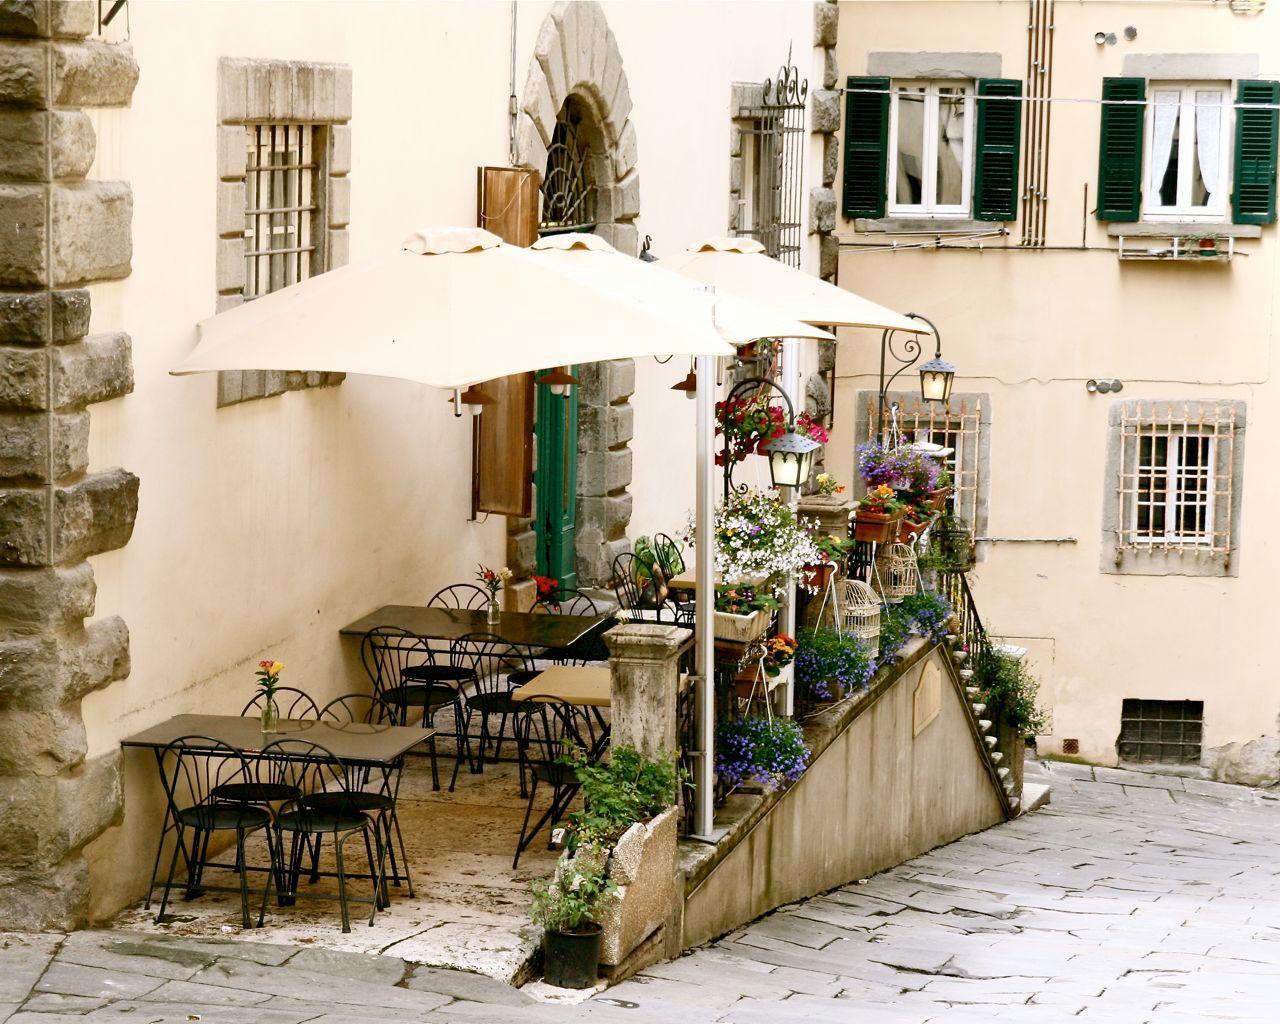 italian tuscan decor | italy photograph - tuscan decor - sunny